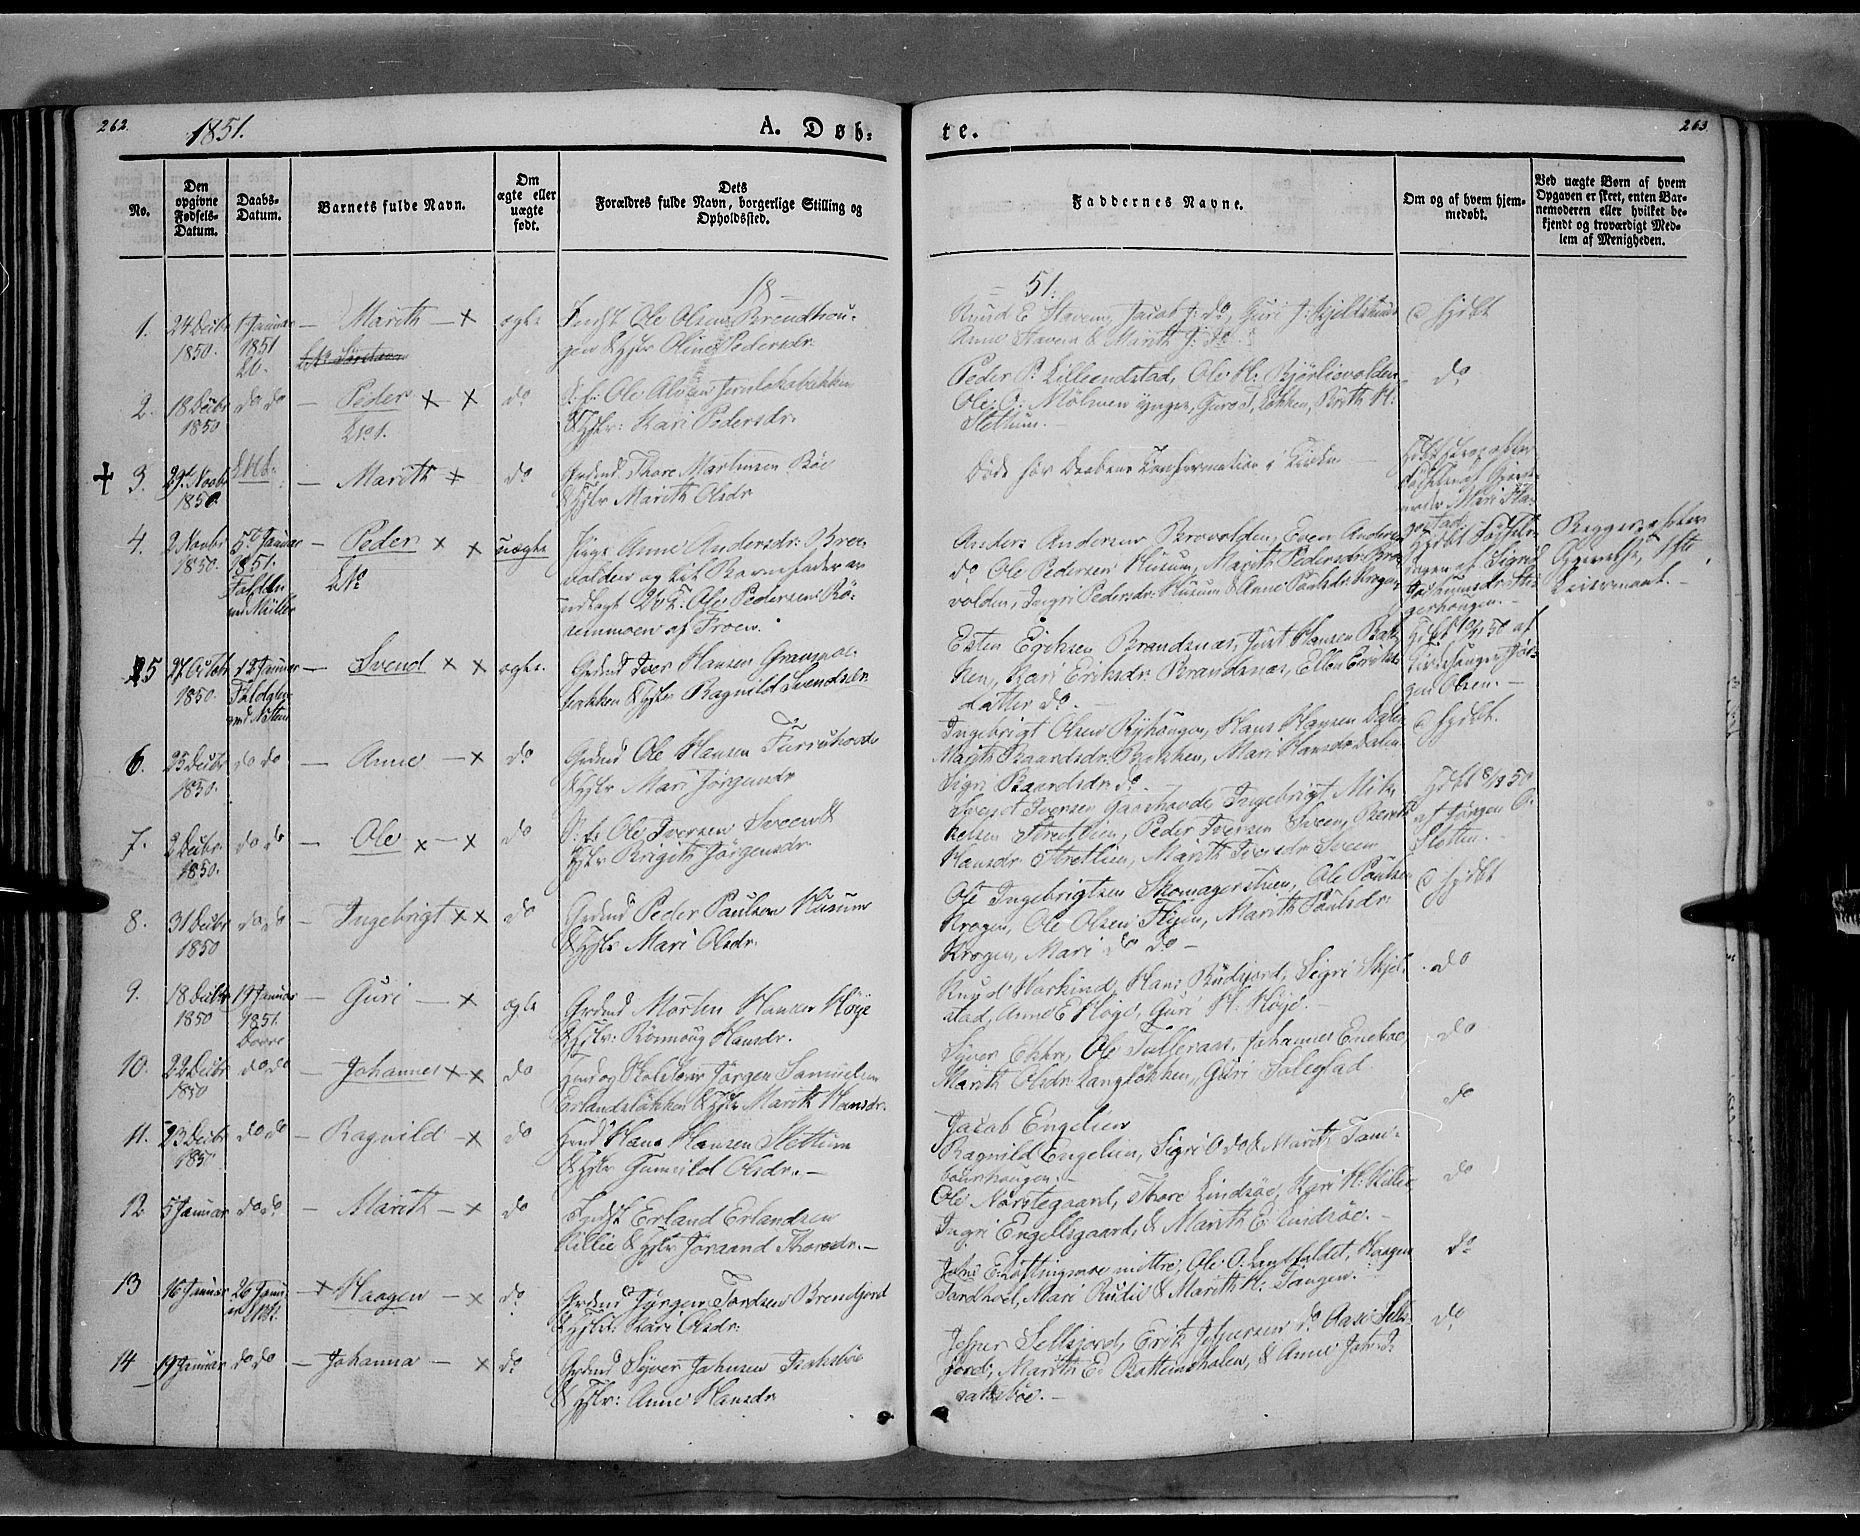 SAH, Lesja prestekontor, Ministerialbok nr. 6A, 1843-1854, s. 262-263